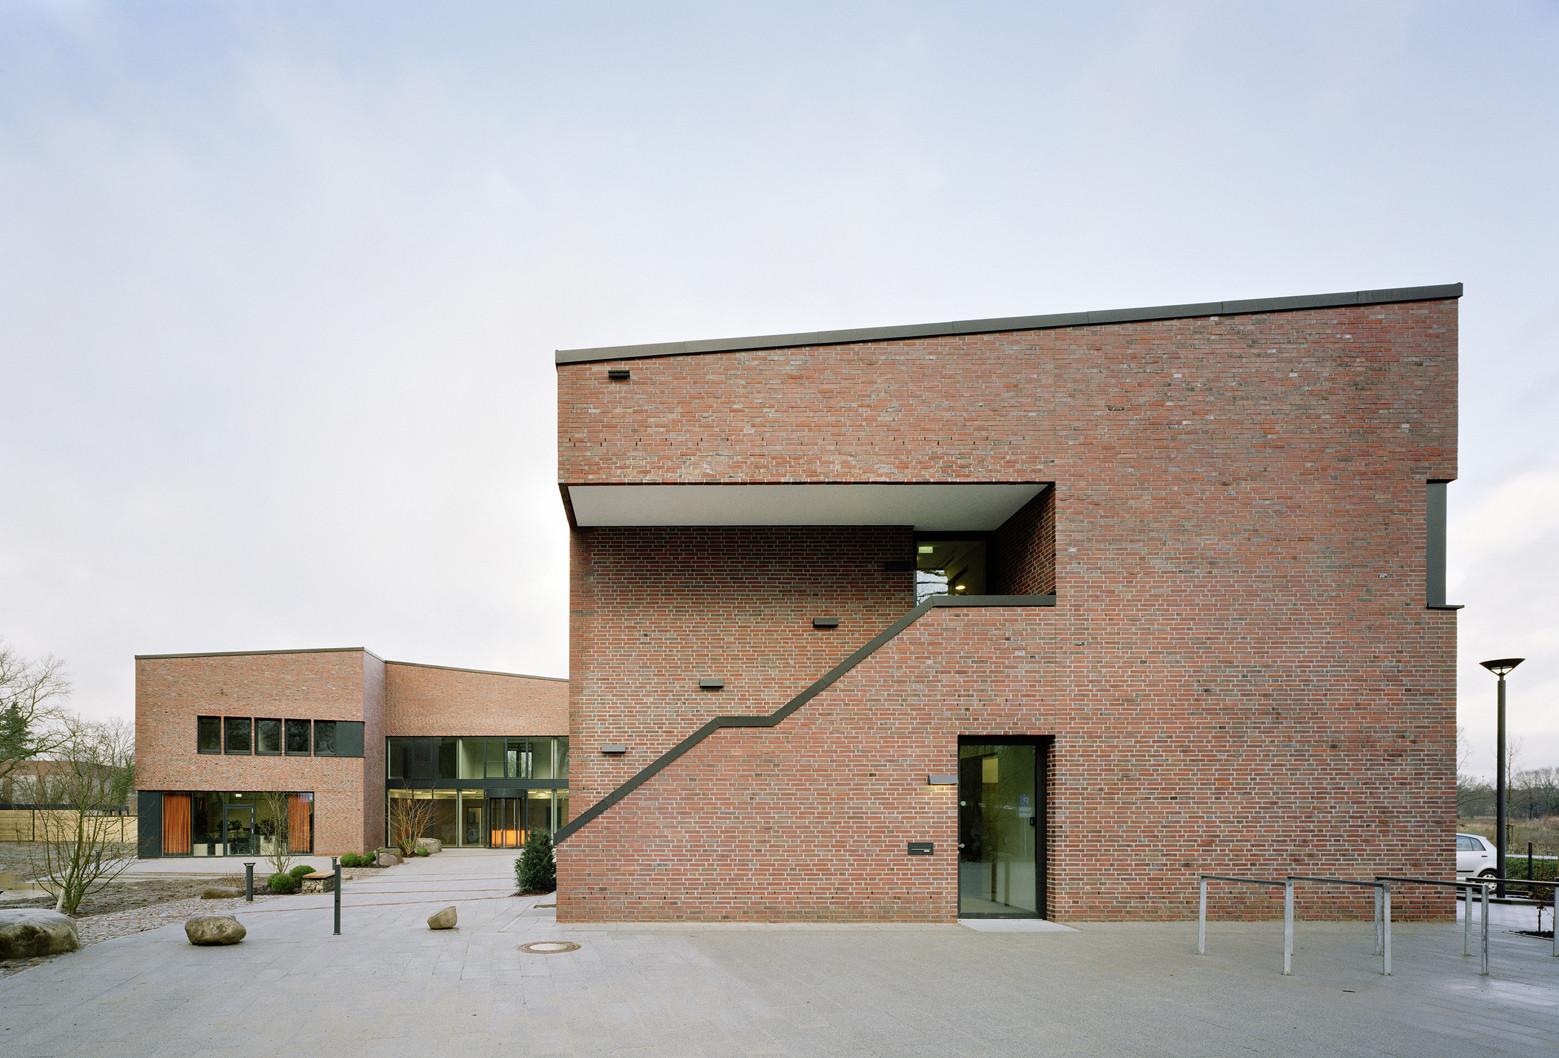 Dorfmüller I Klier Hamburg: Administrative Headquarters RBSUM / KBNK